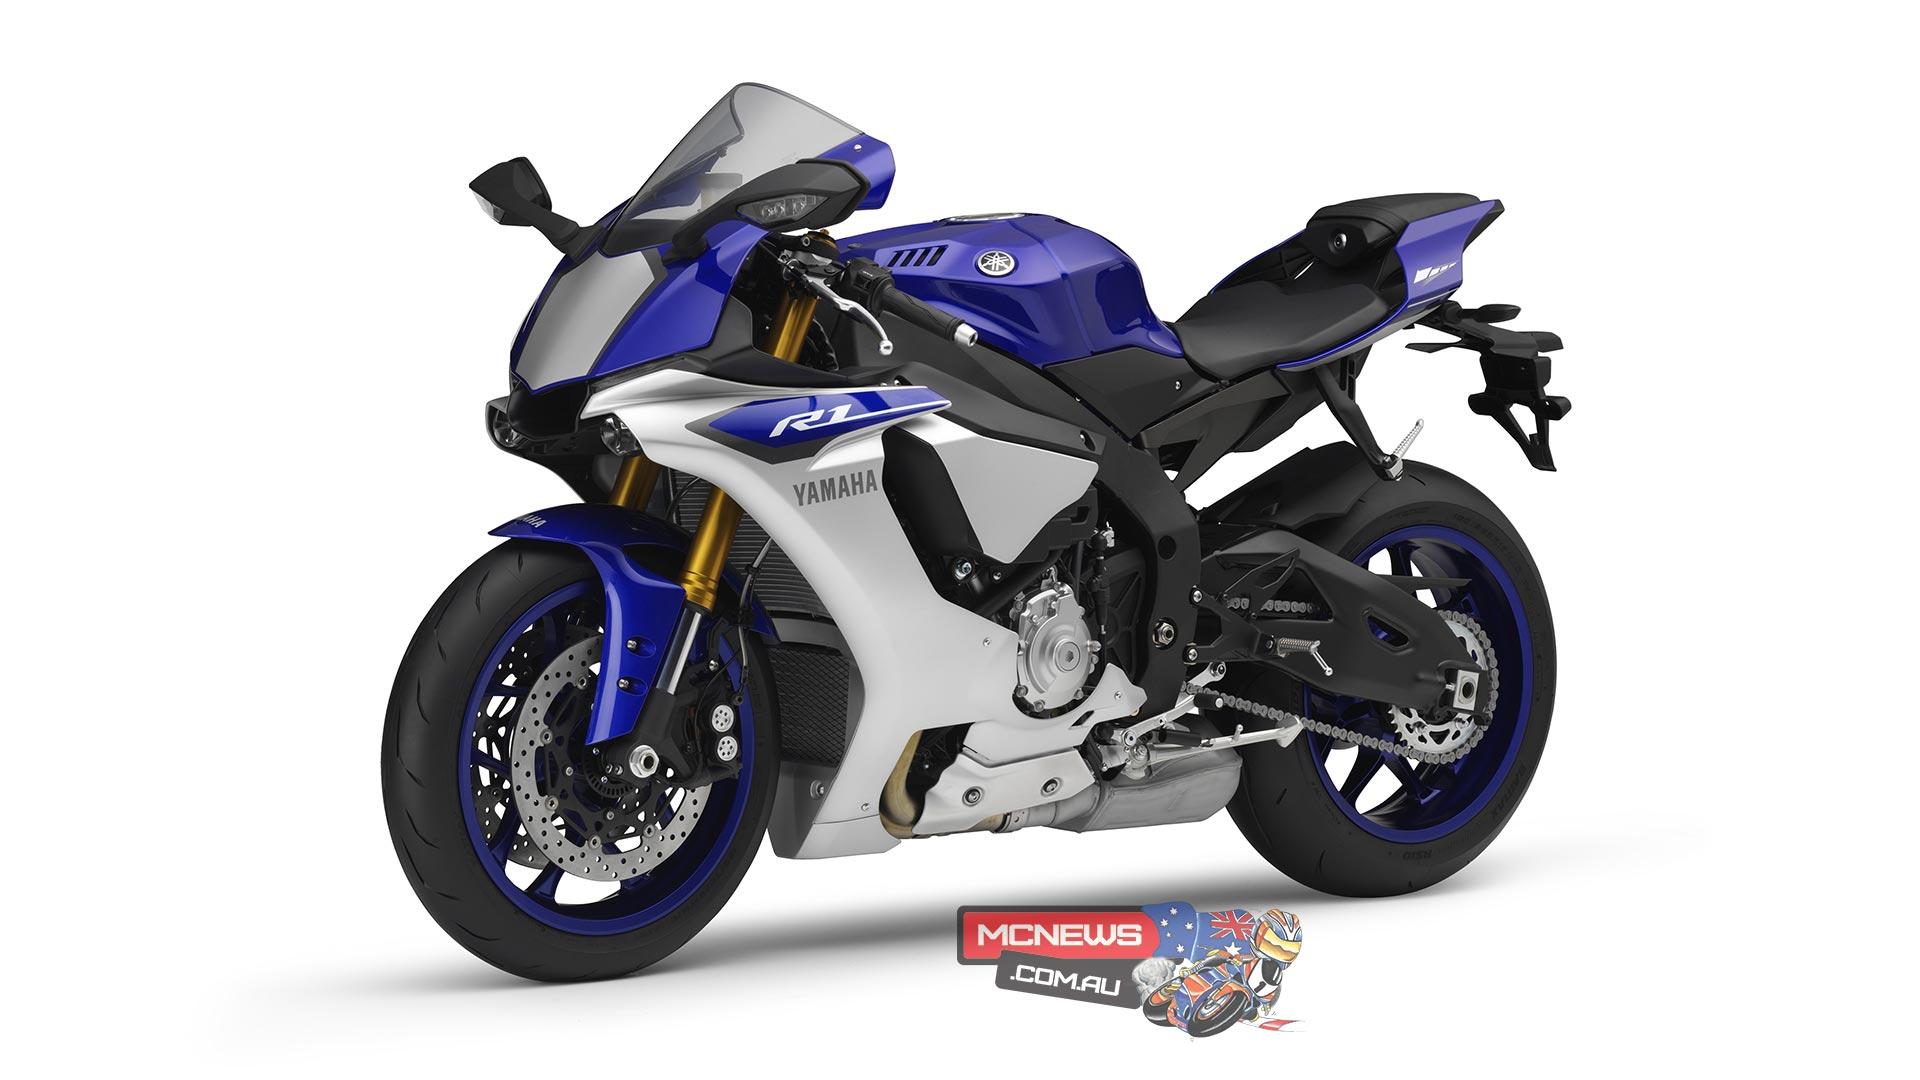 2015 Yamaha YZF R1 Full Reveal